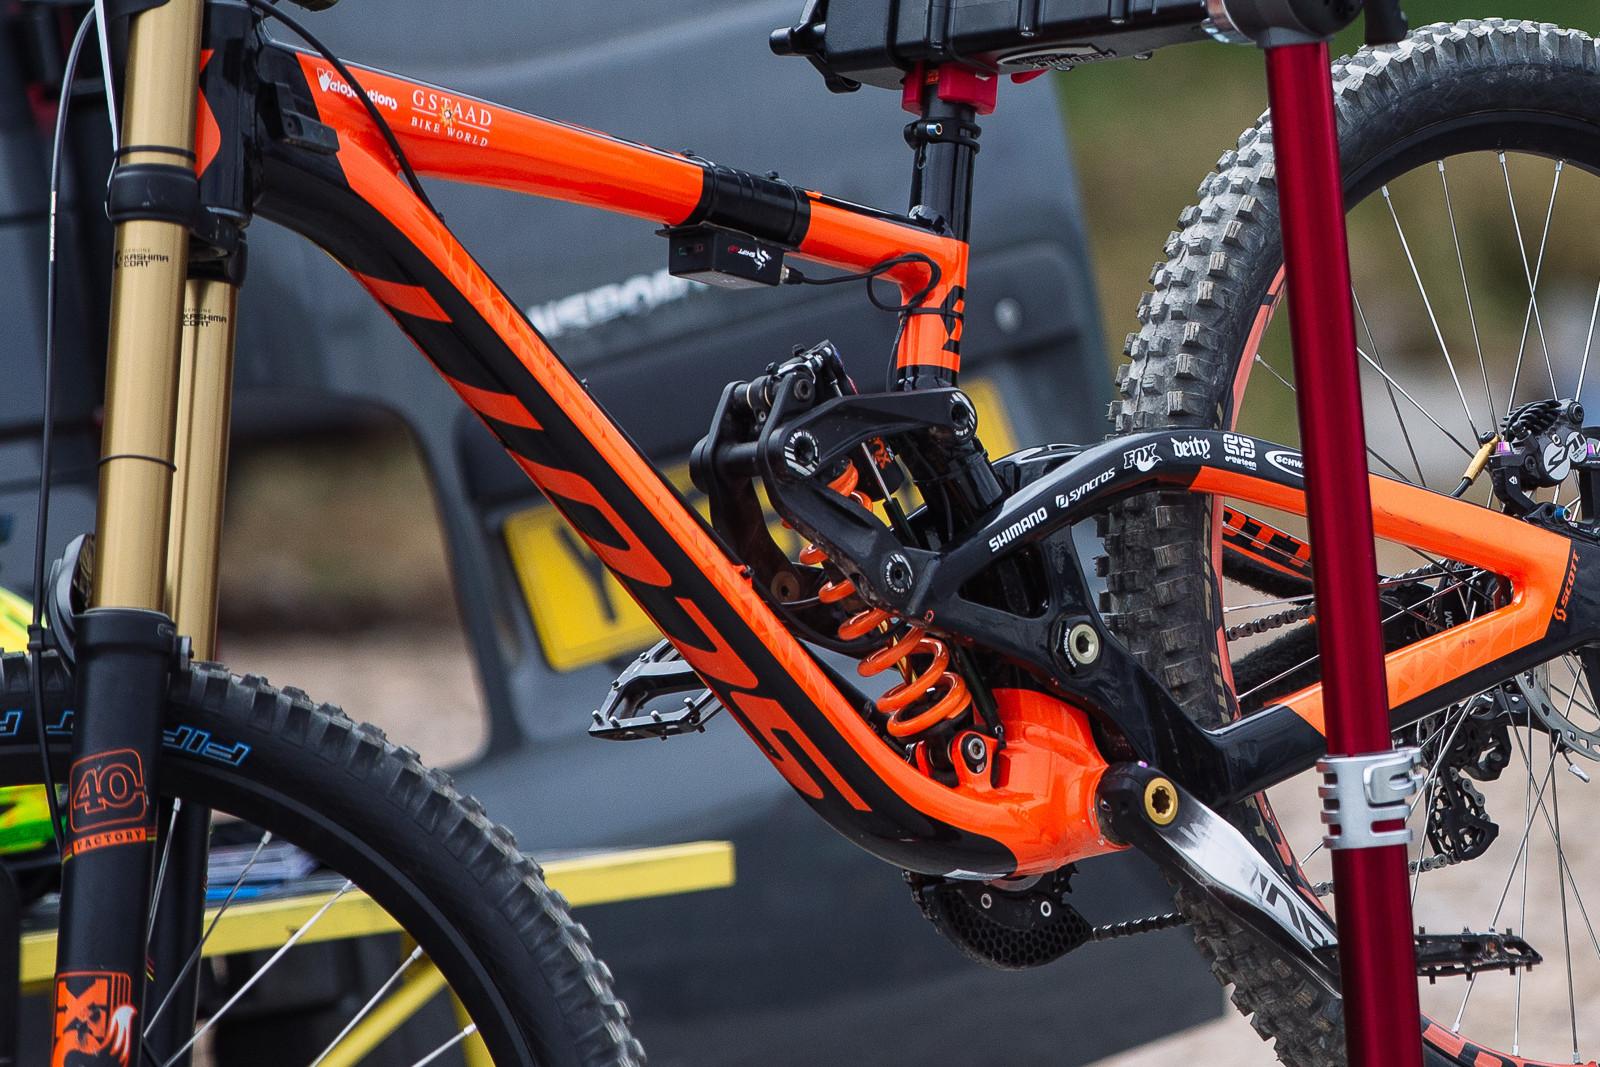 Data Acquisition on Brendan Fairclough's Gambler - PIT BITS - BDS Fort William - Mountain Biking Pictures - Vital MTB